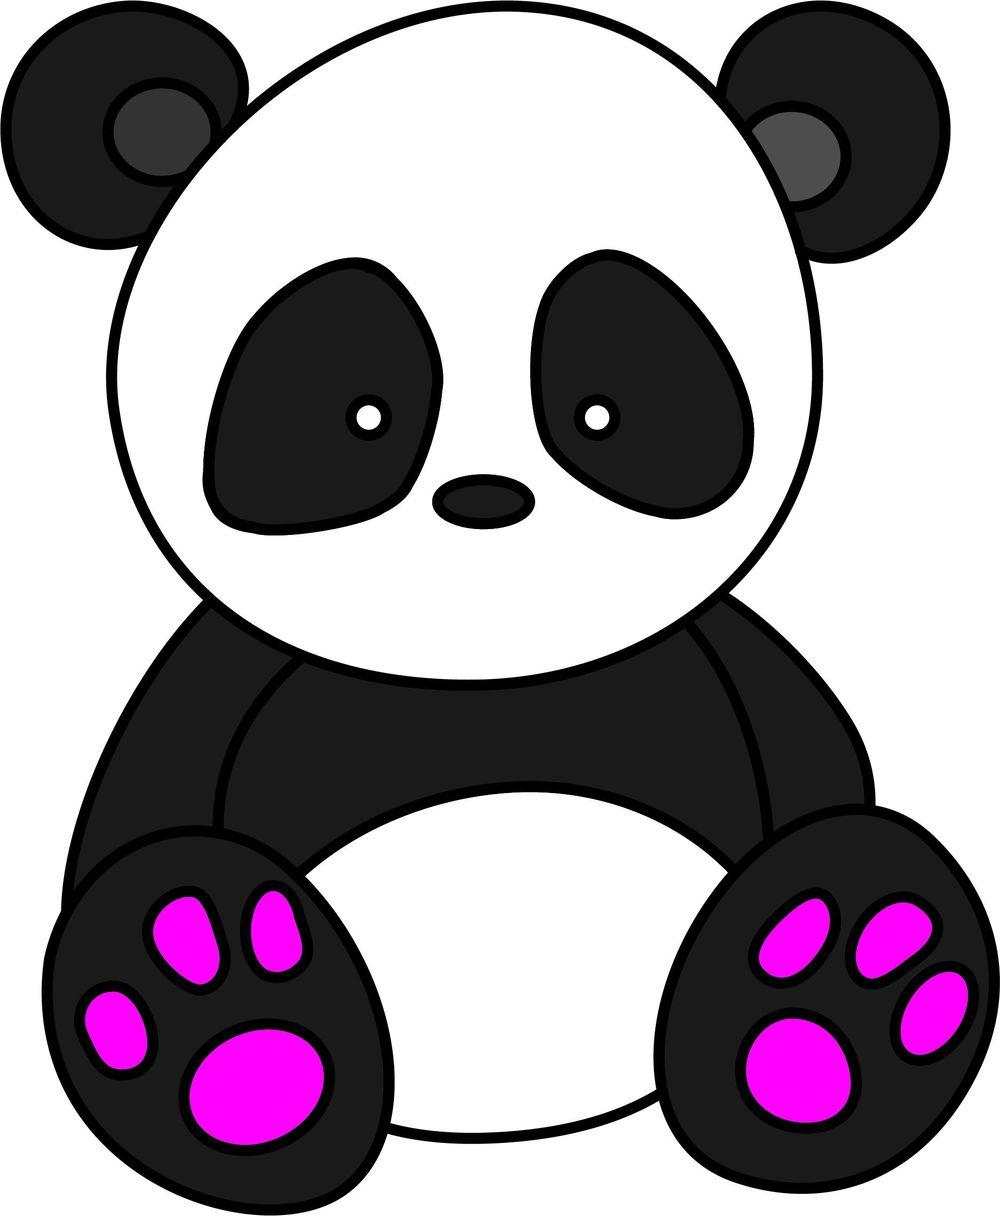 Ellipse Tool Panda - image 1 - student project